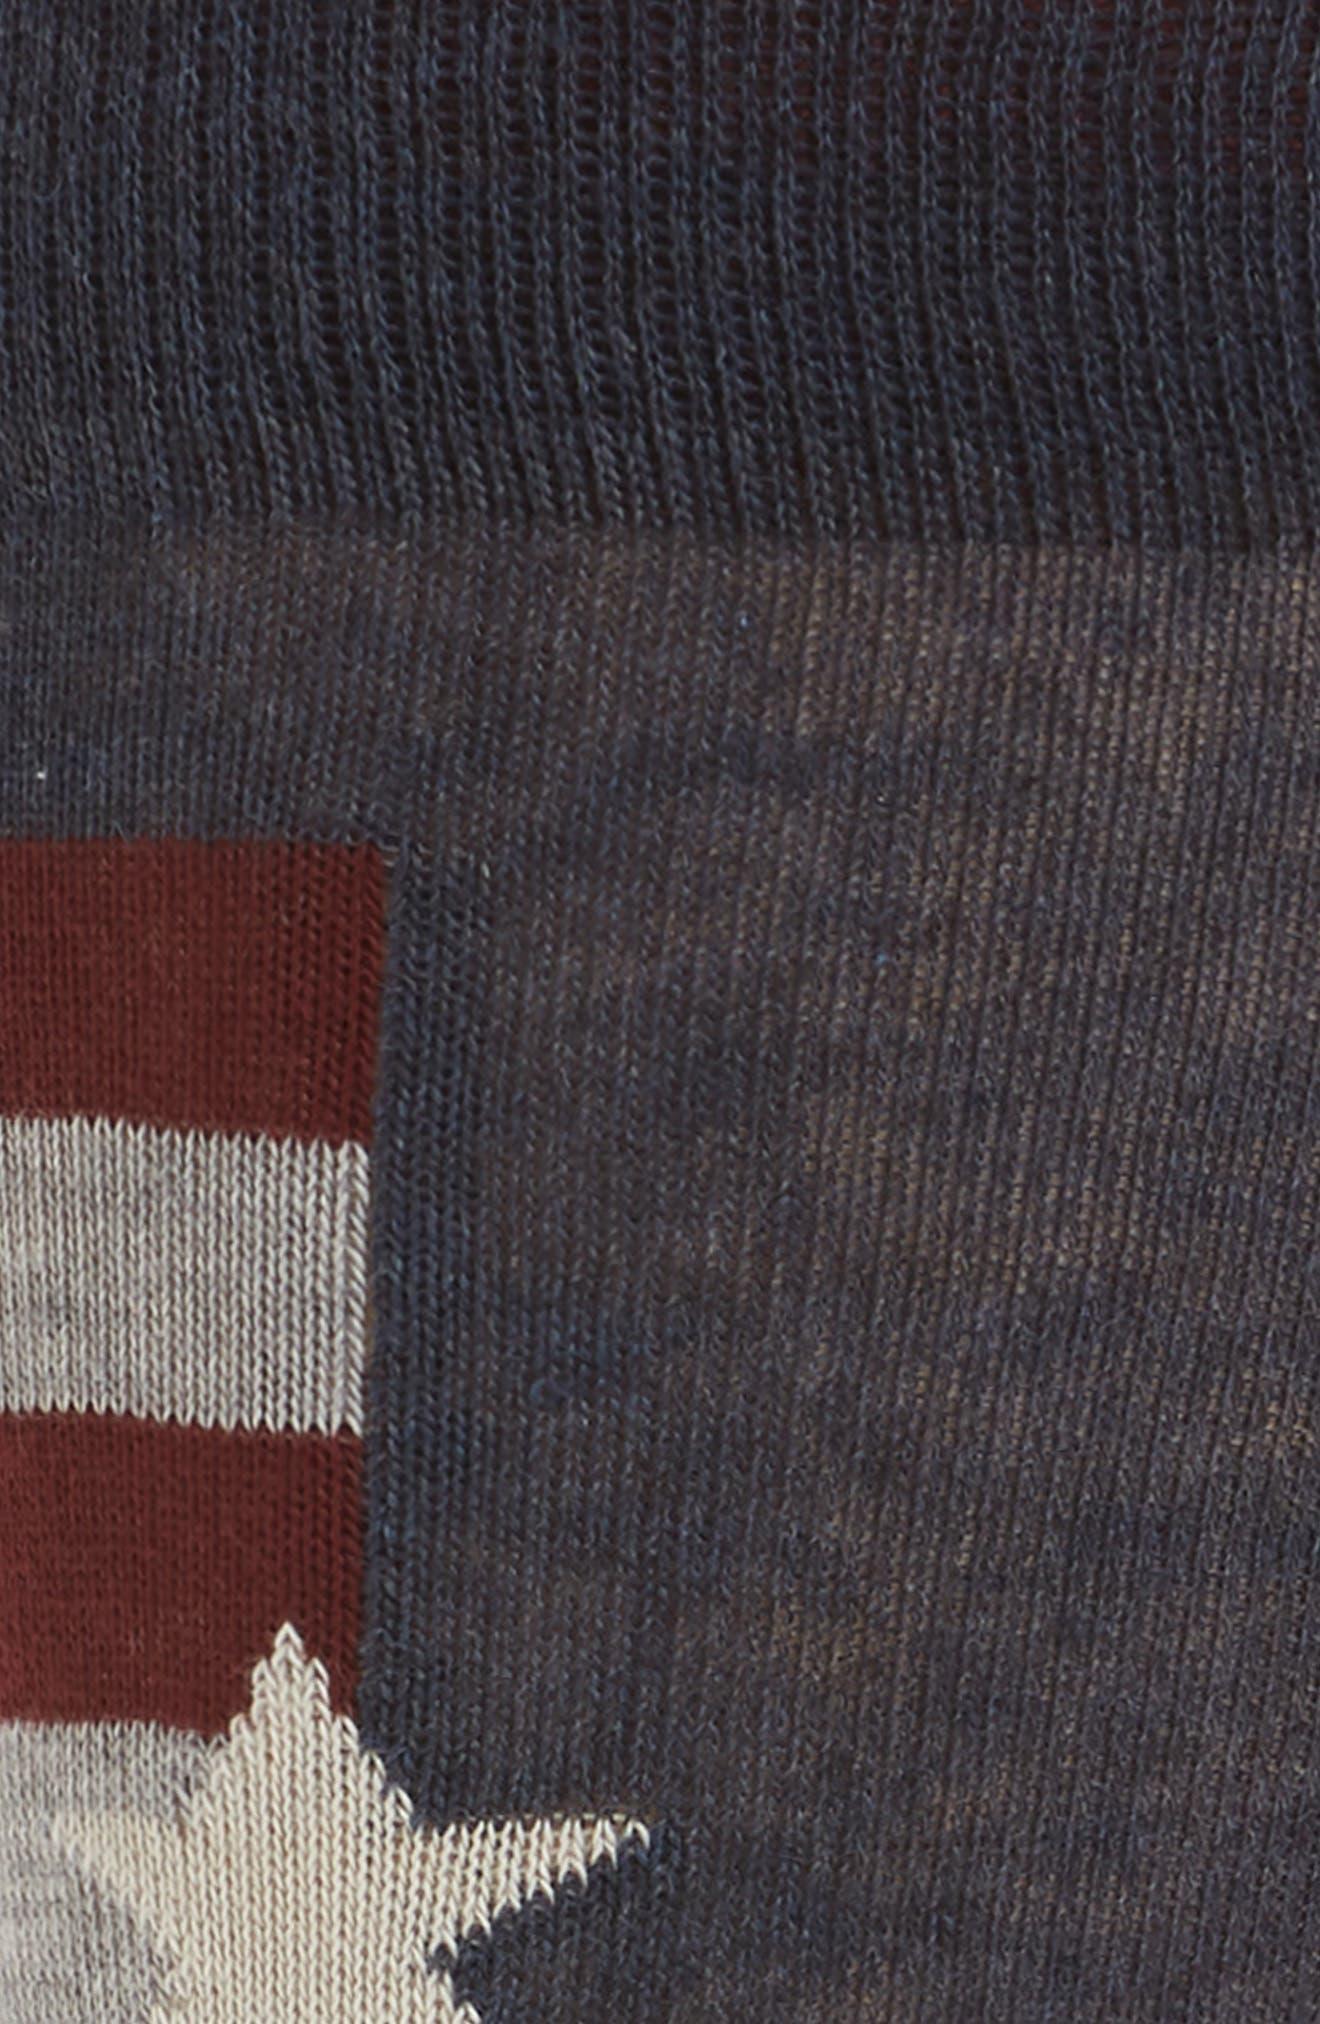 Stars and Stripes Socks,                             Alternate thumbnail 2, color,                             Denim